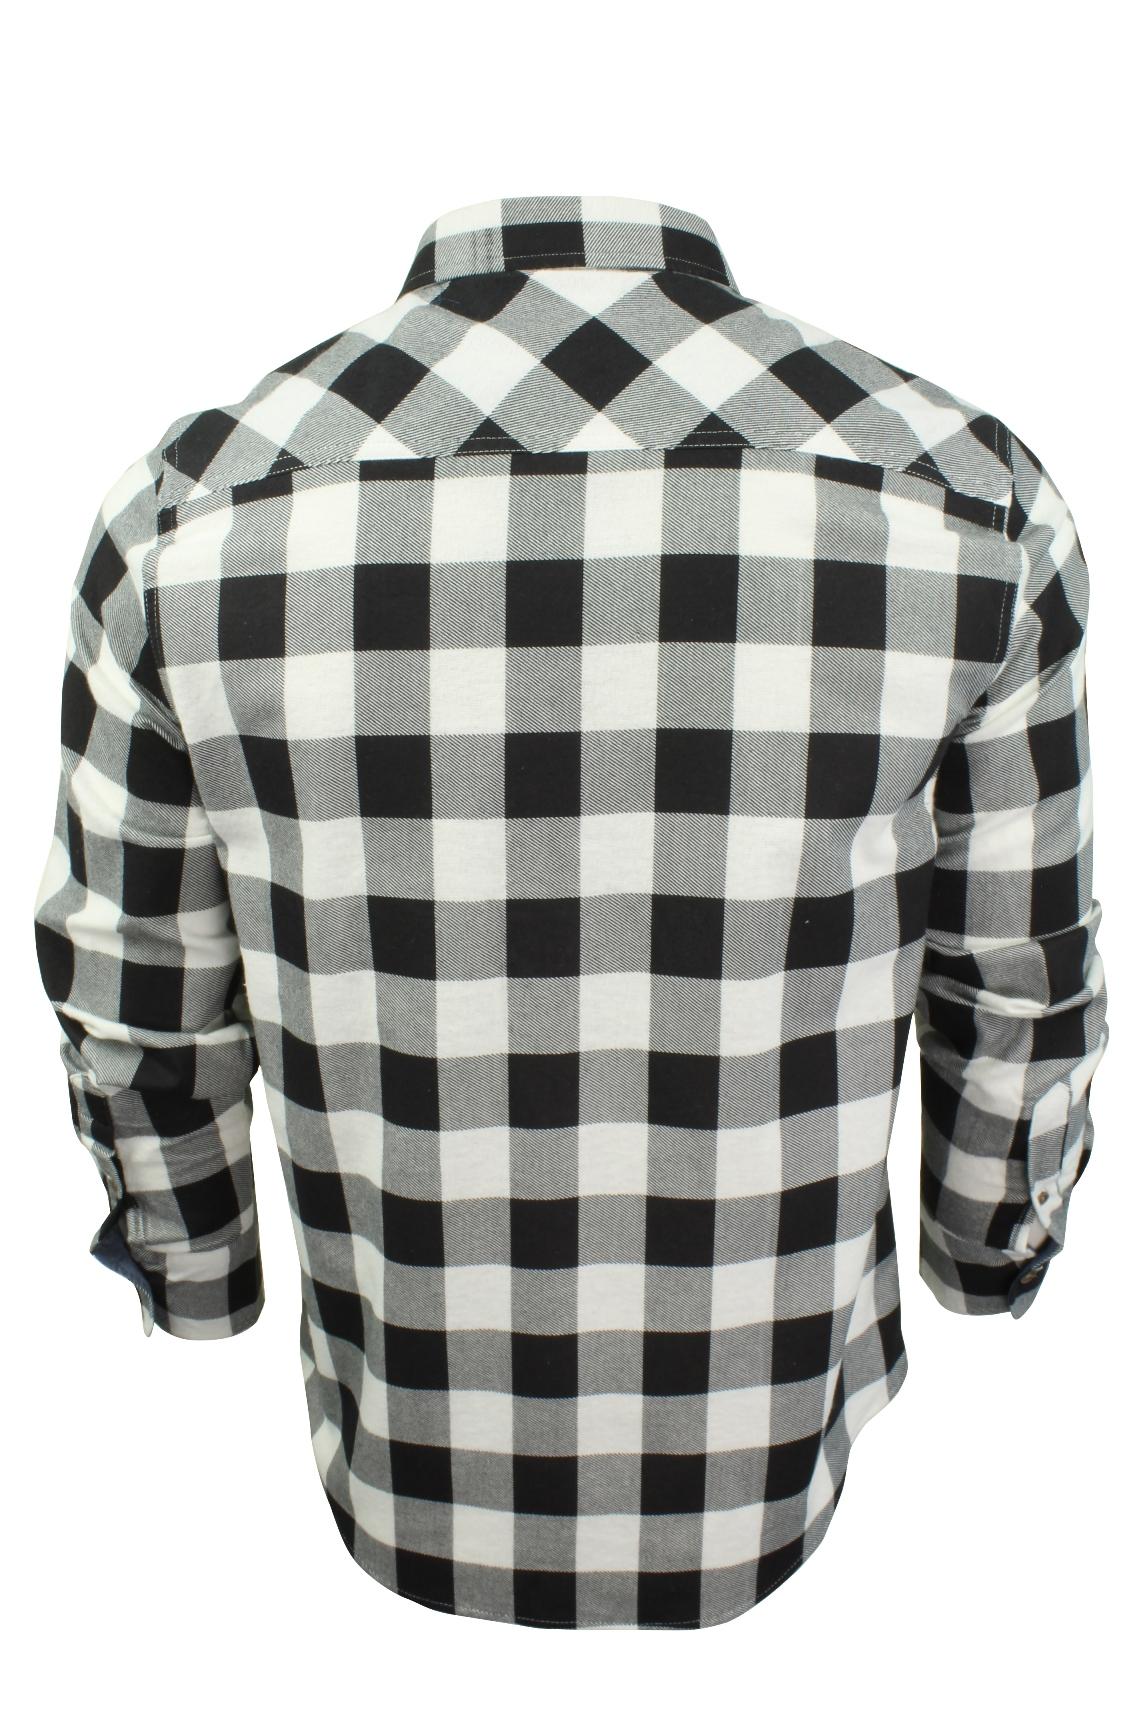 Brave-Soul-Brushed-Flannel-Check-Cotton-Jack-Shirt-Long-Sleeved thumbnail 24